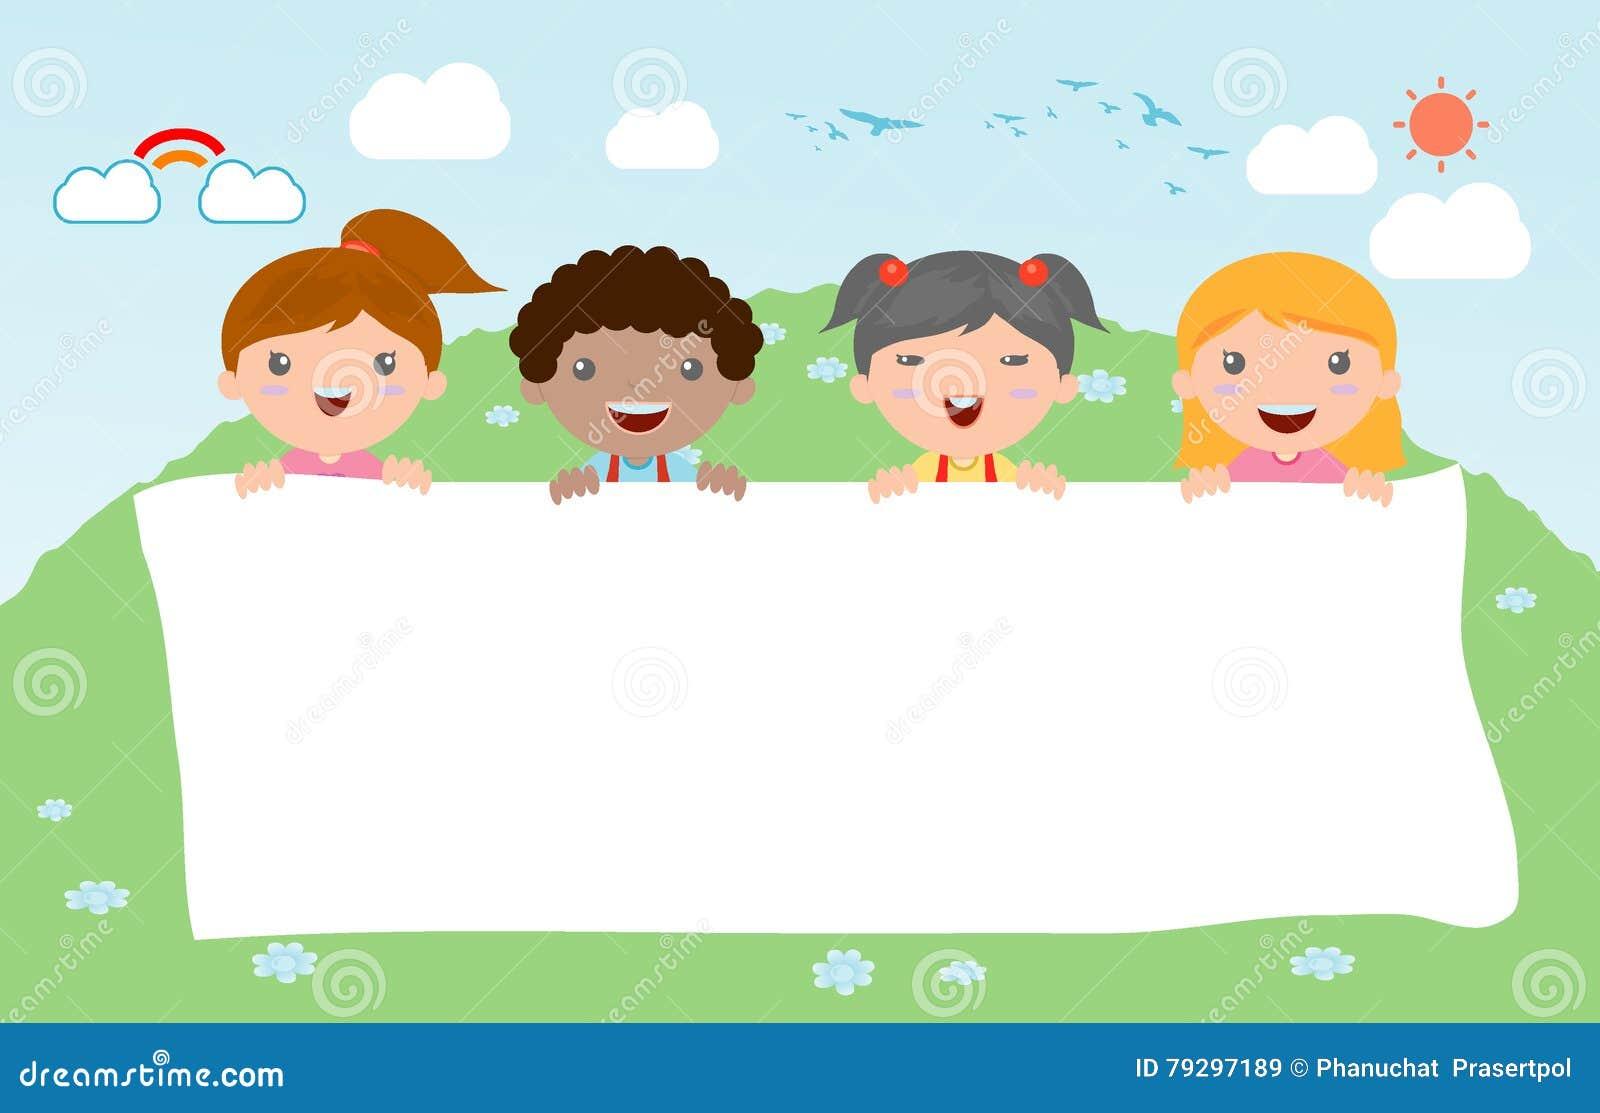 Kids Peeping Behind Placard, Happy Children, Cute Little Kids On ...